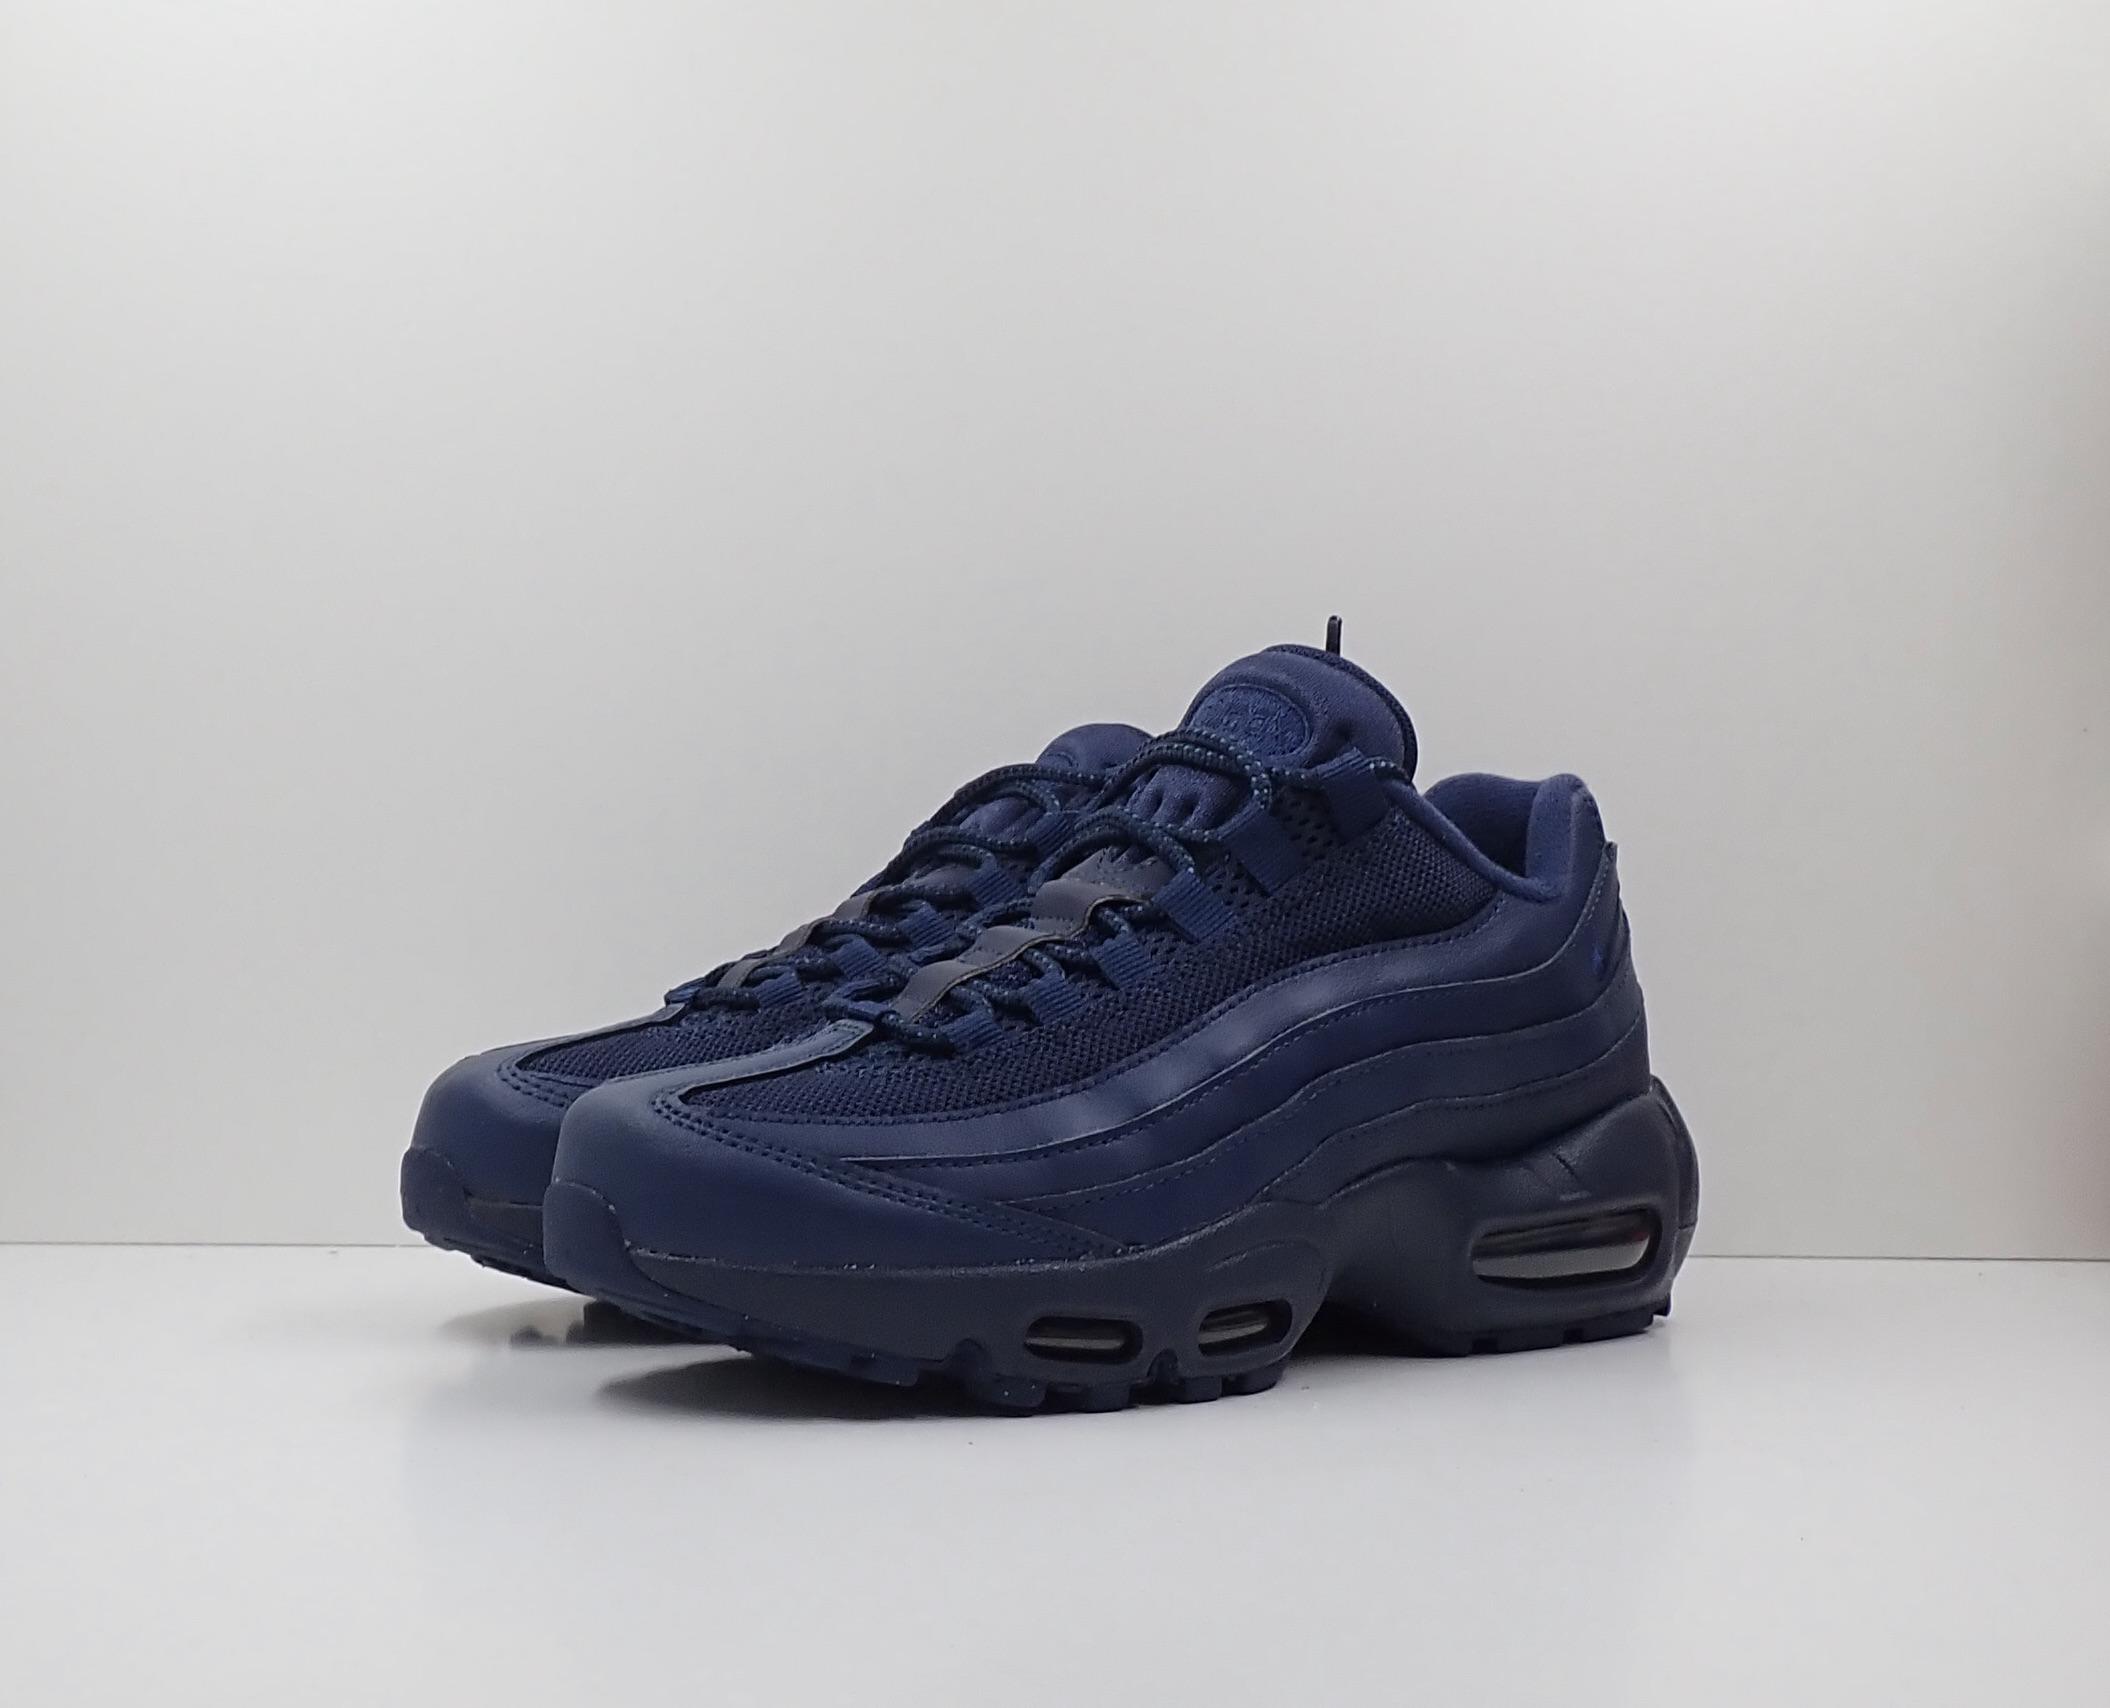 Nike Air Max 95 Midnight Navy (GS)